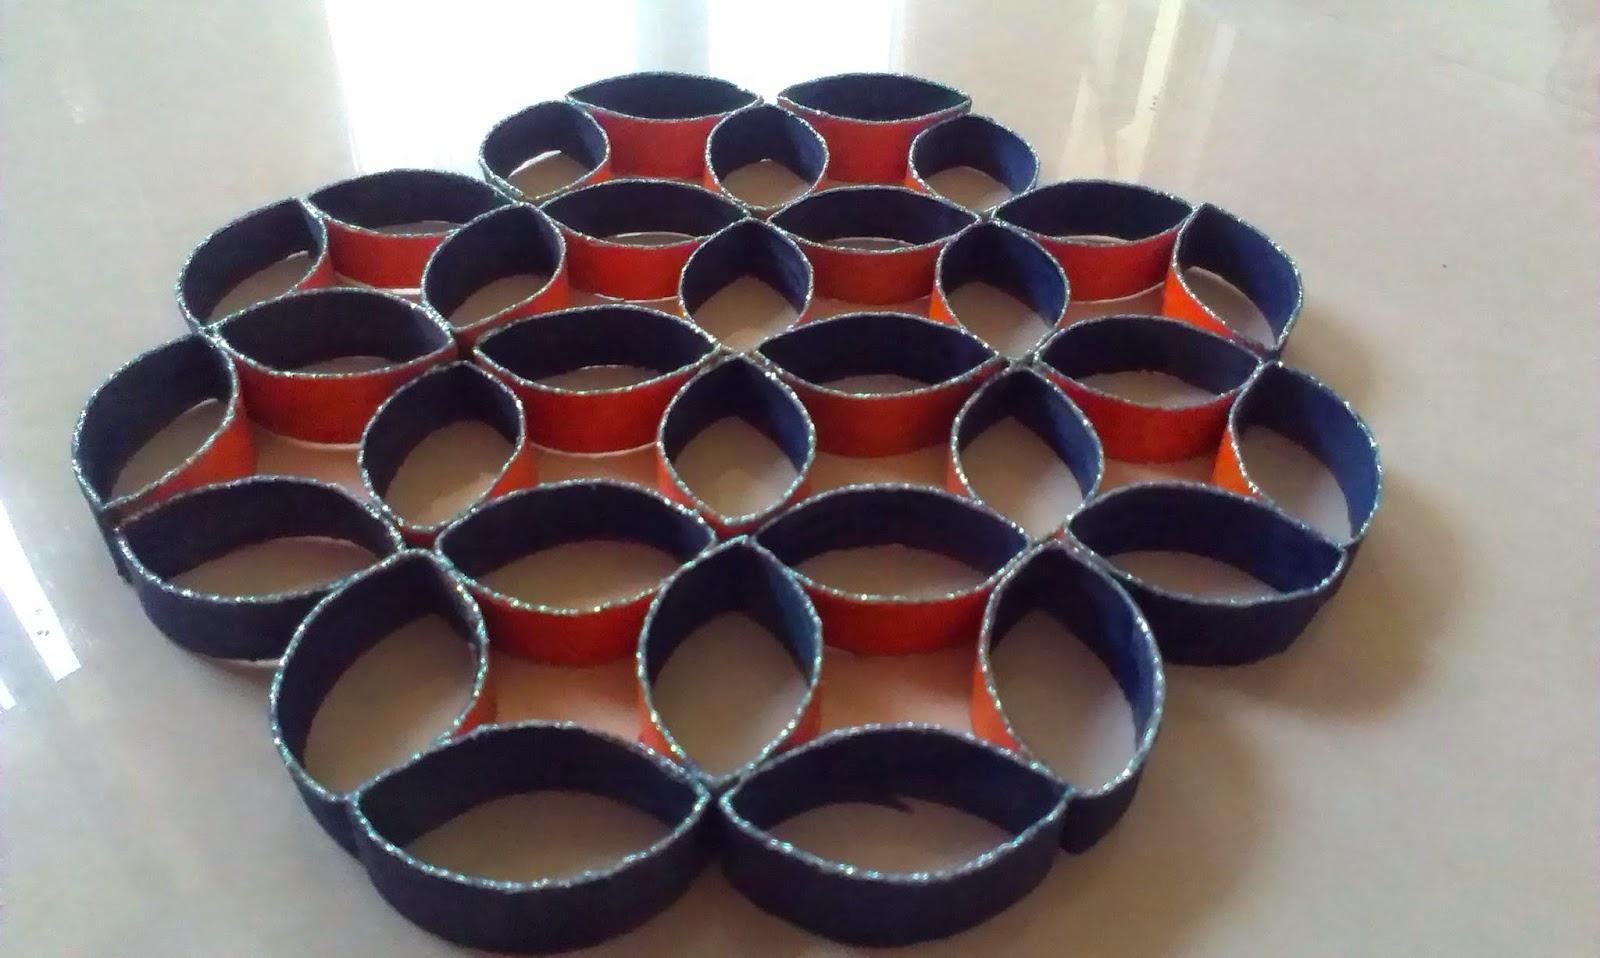 Tissue paper roll decorative for Decorative paper rolls